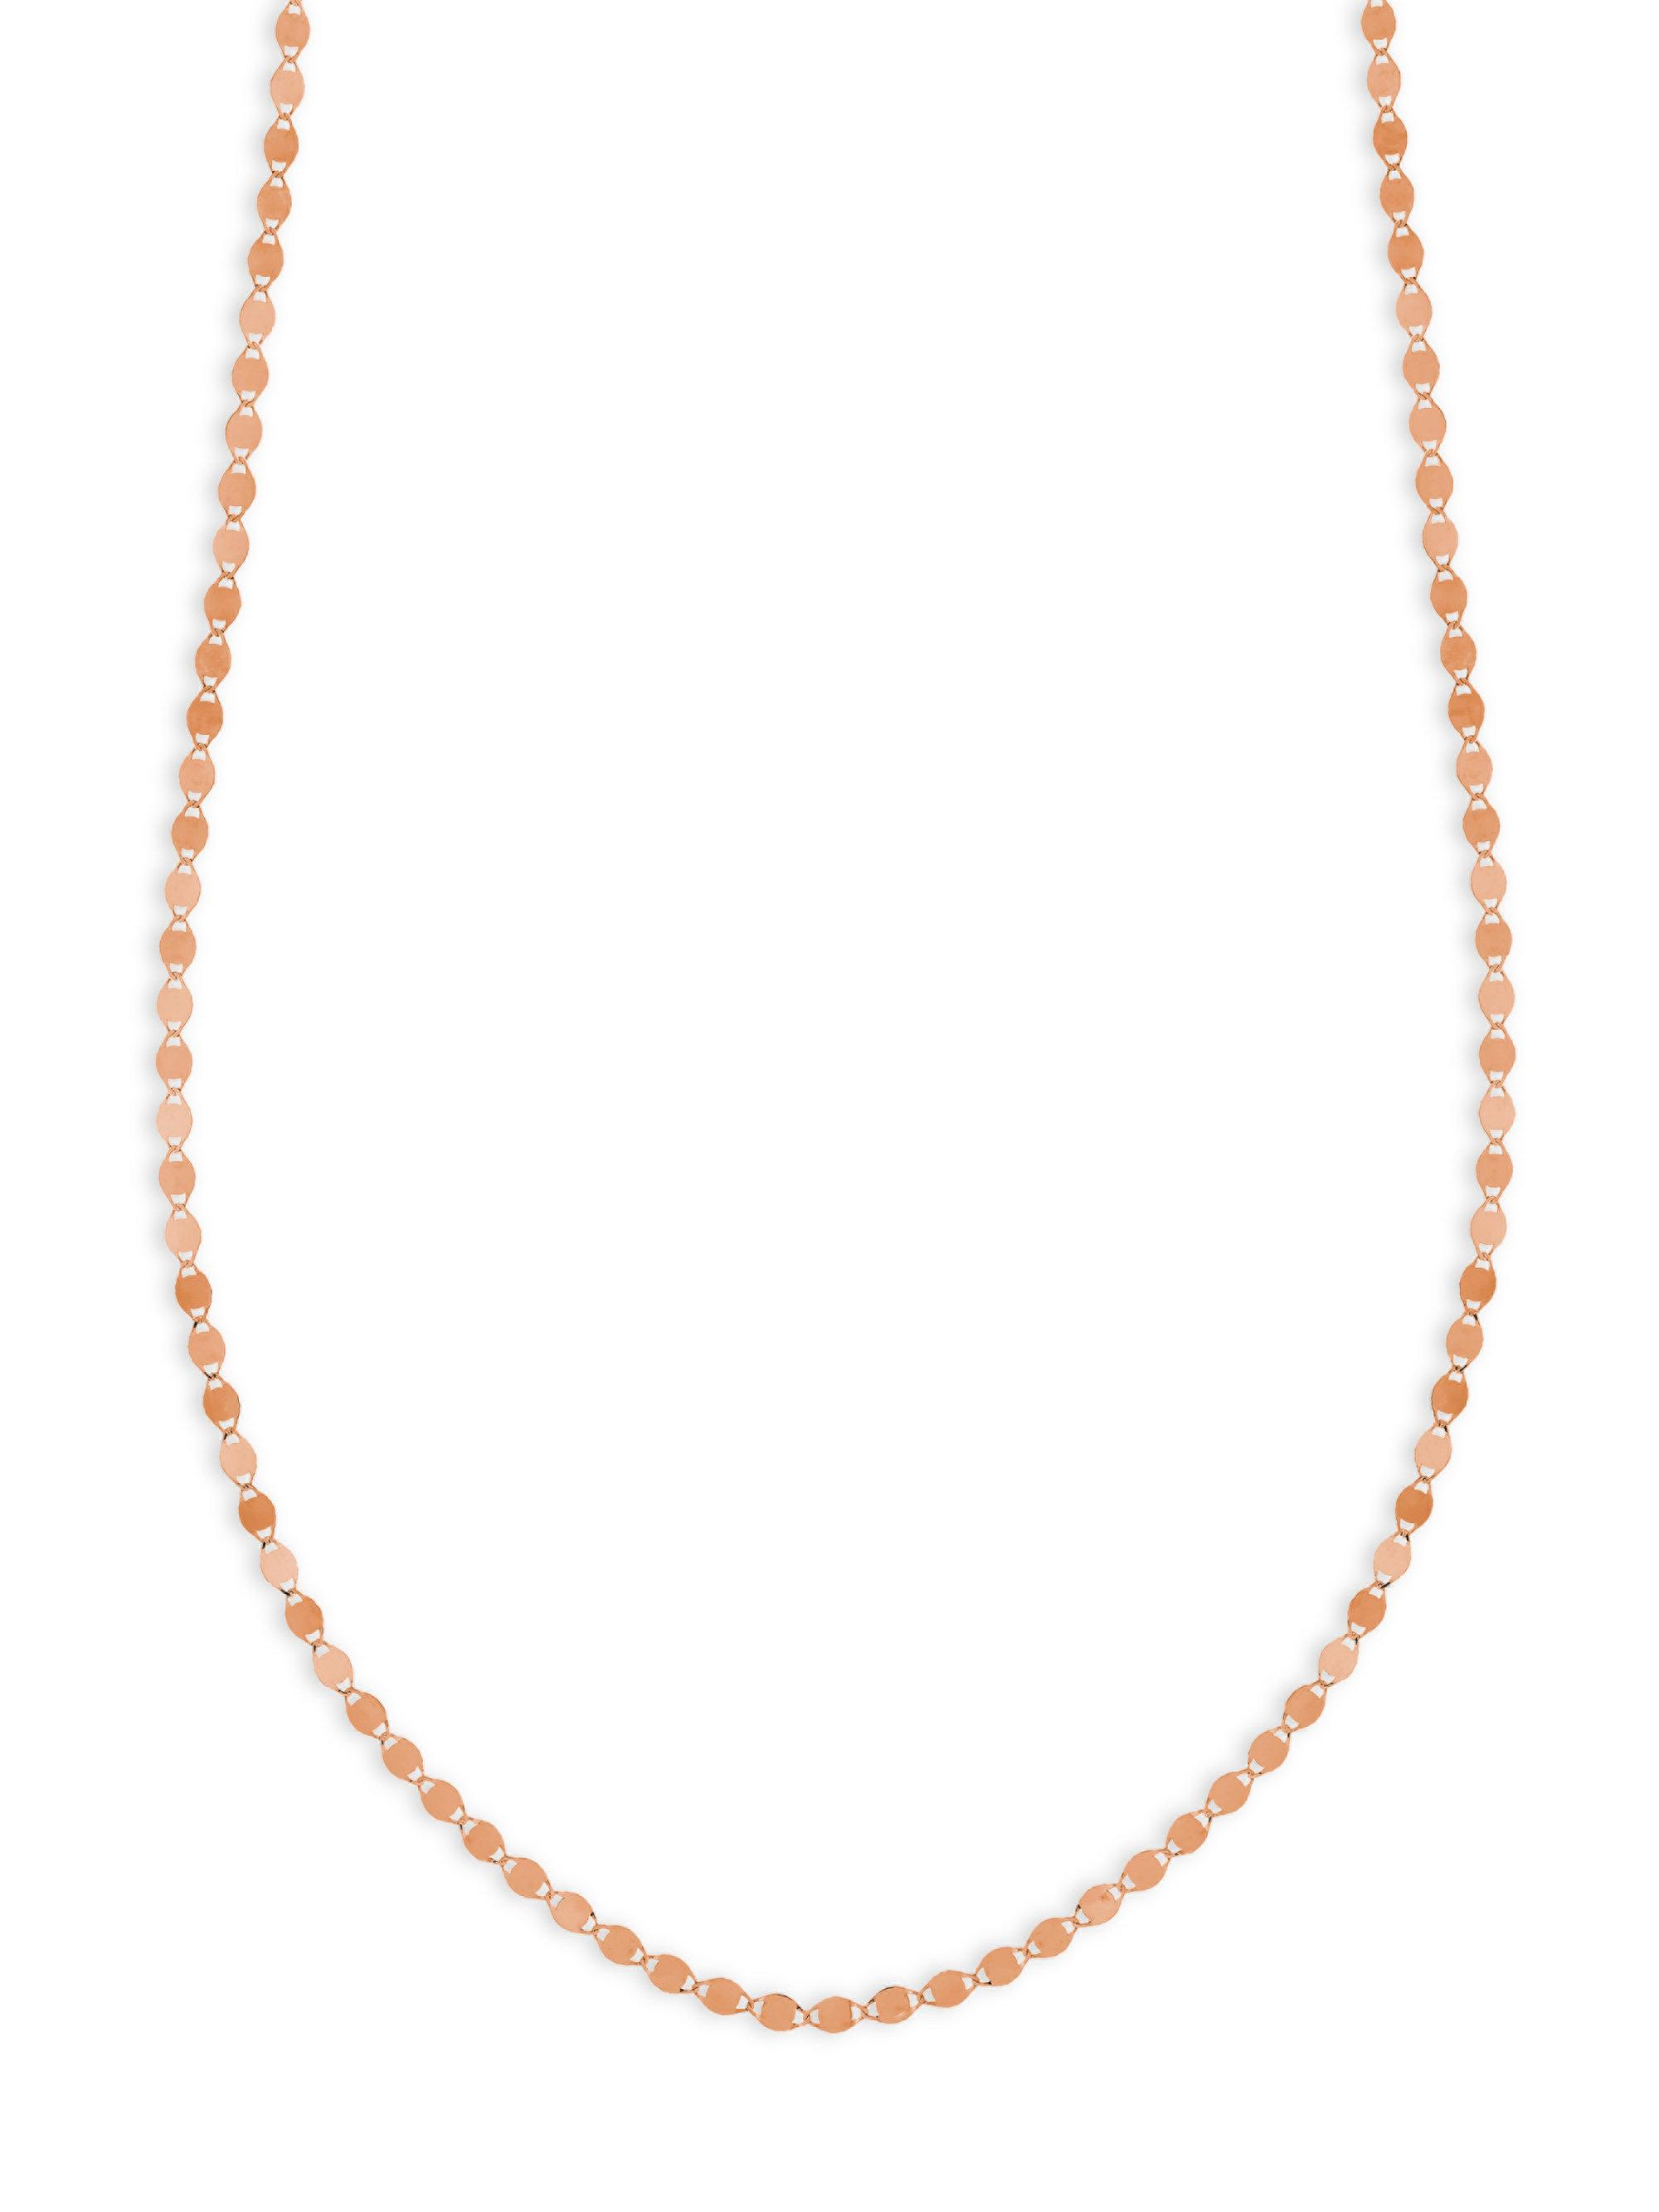 Lana Jewelry Nude Disc Fringe Long Necklace, 30